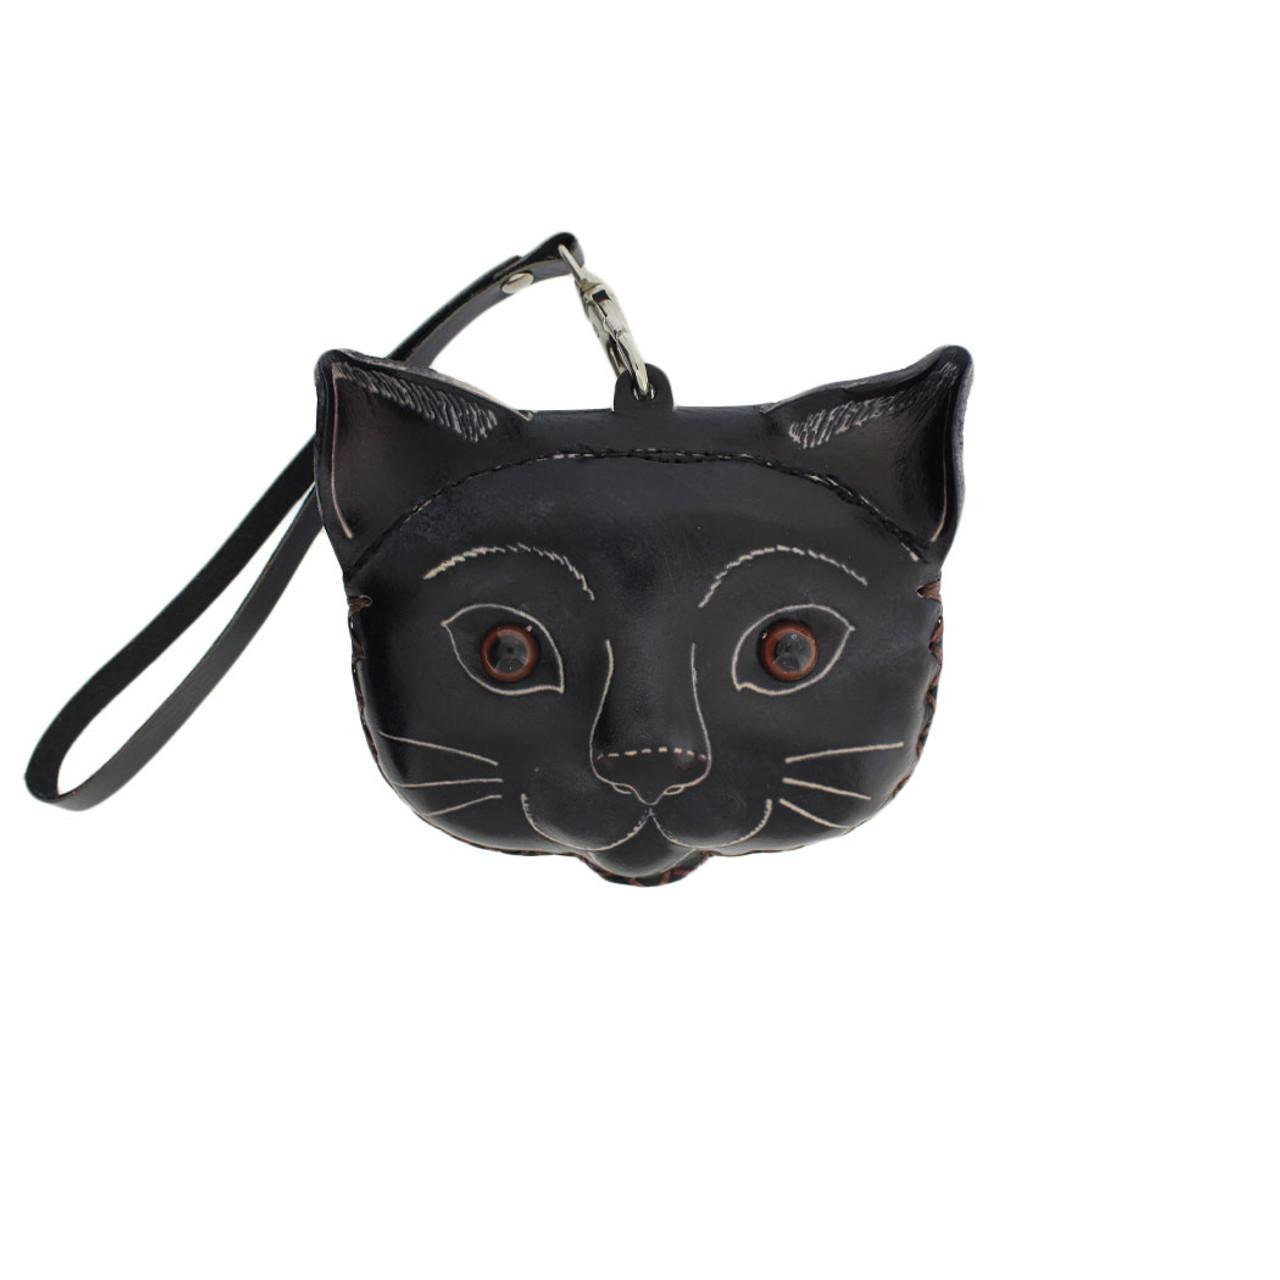 85a1526bfb1 Black Leather Cat Wristlet Coin Purse with Strap - Purple Leopard Boutique